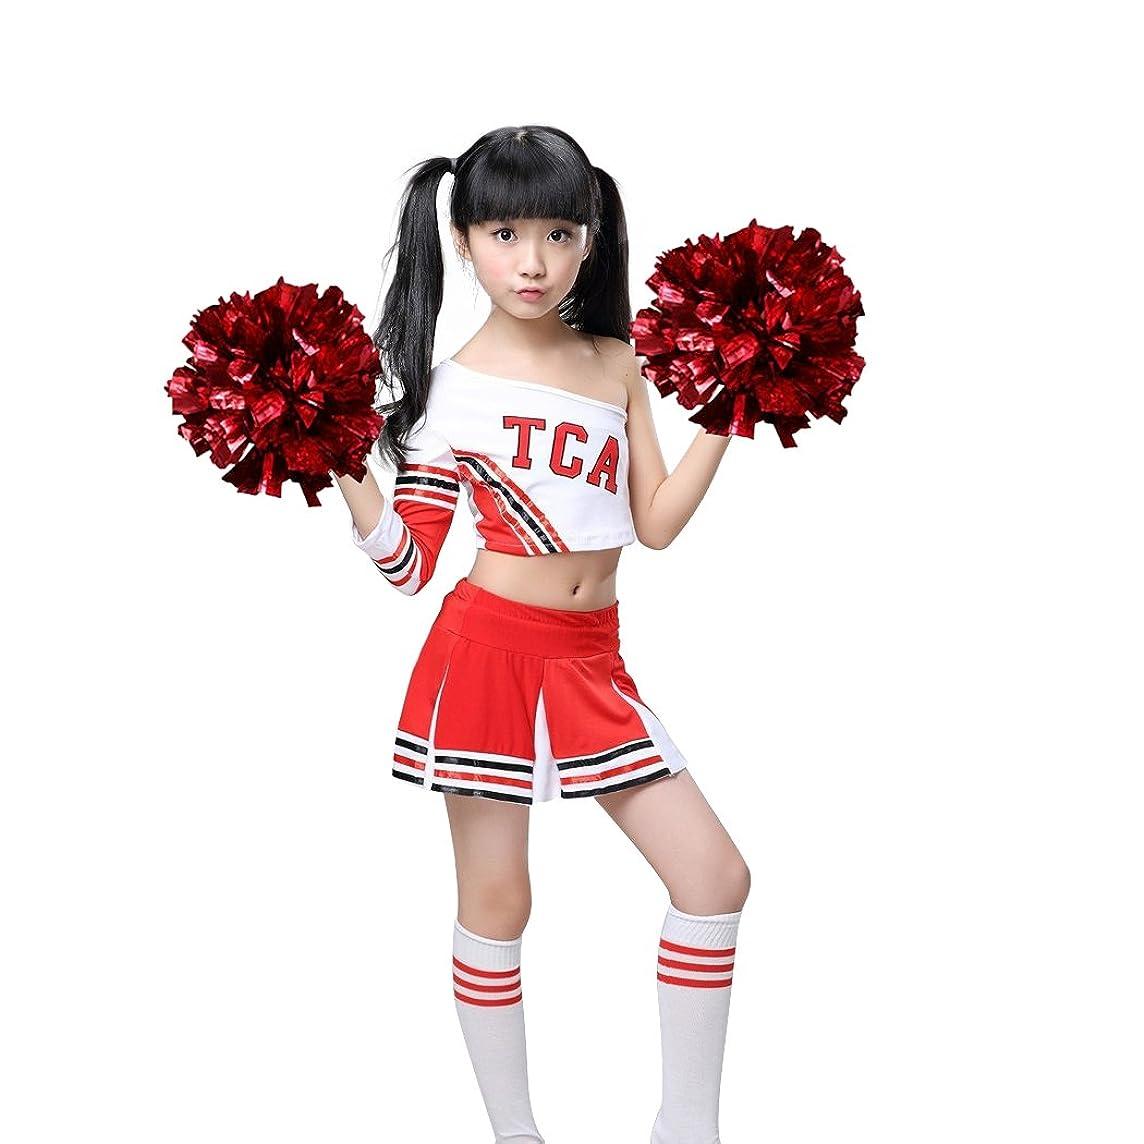 Girls Red & White Cheerleader Outfit + Poms Socks Cheer Uniform Dress 3-15Yrs